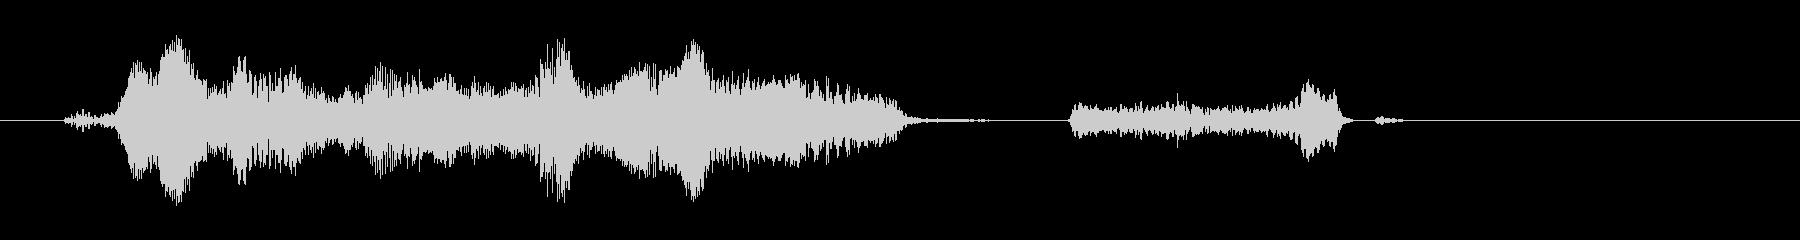 SF系ワンショット(フャーンファン)の未再生の波形